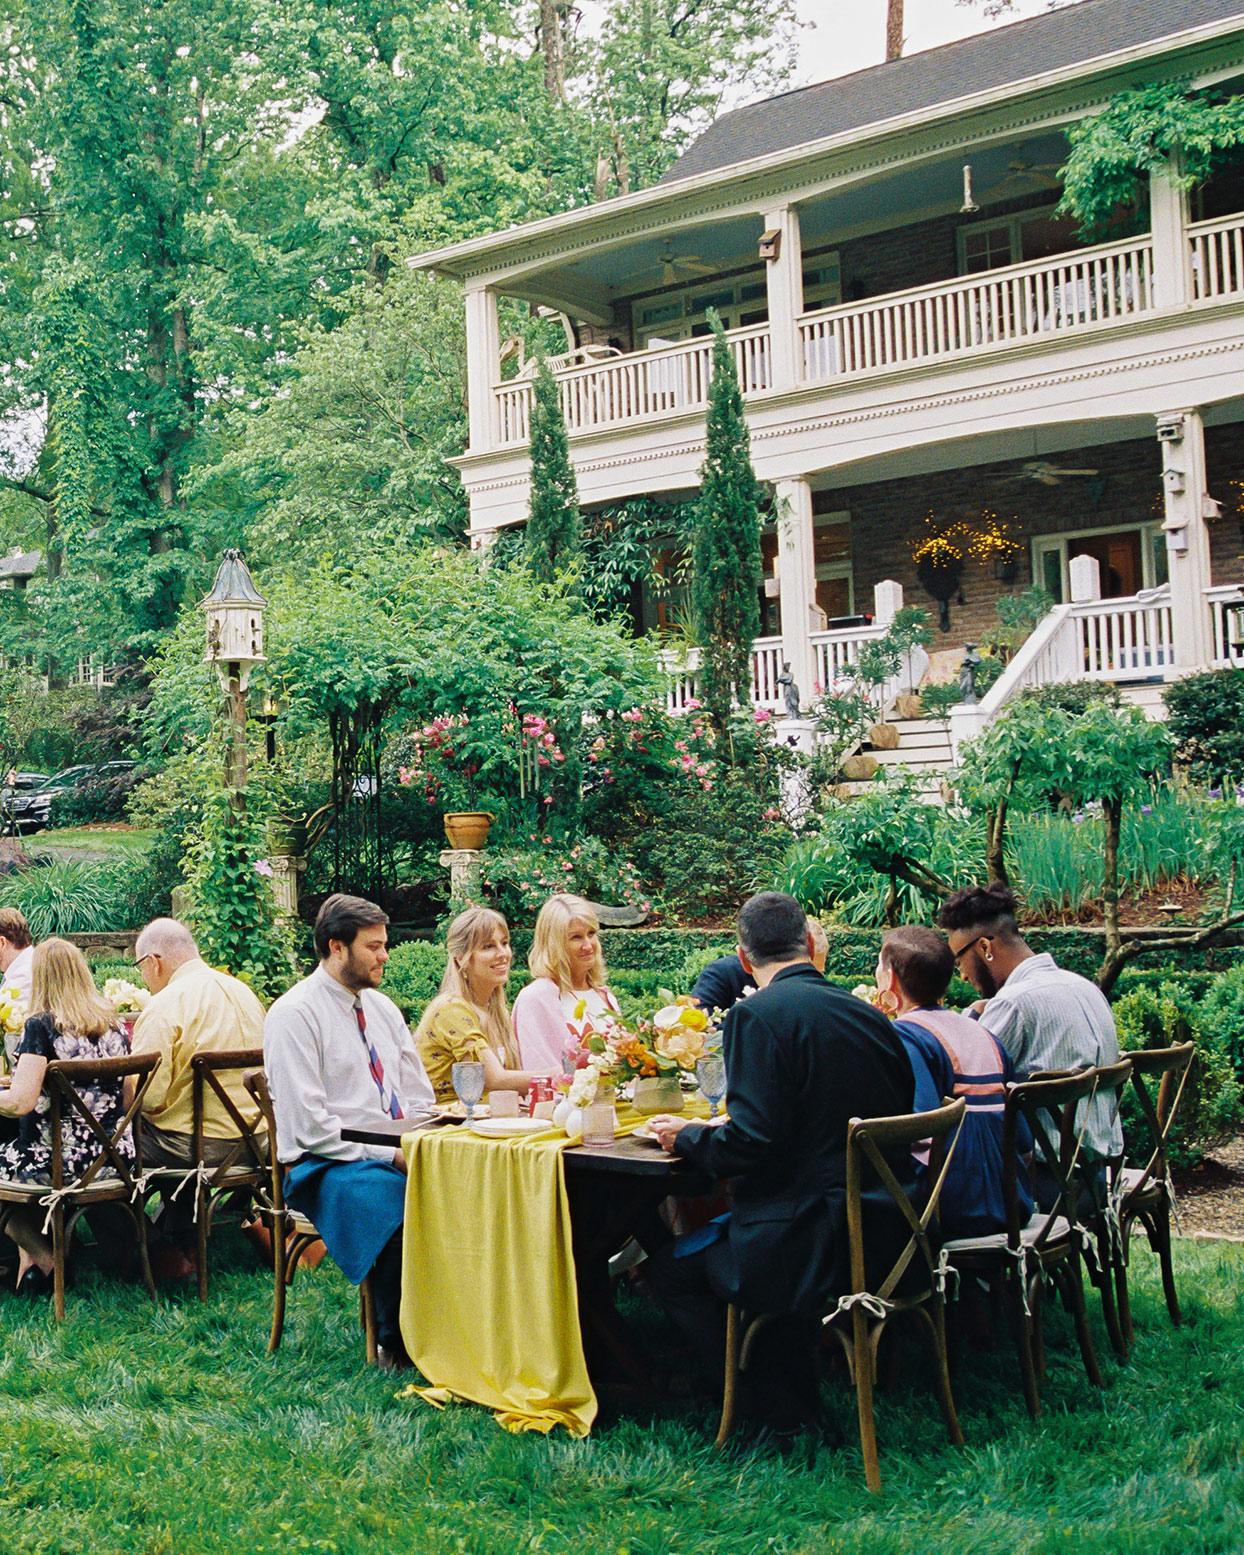 ashley scott outdoor reception tables on lawn